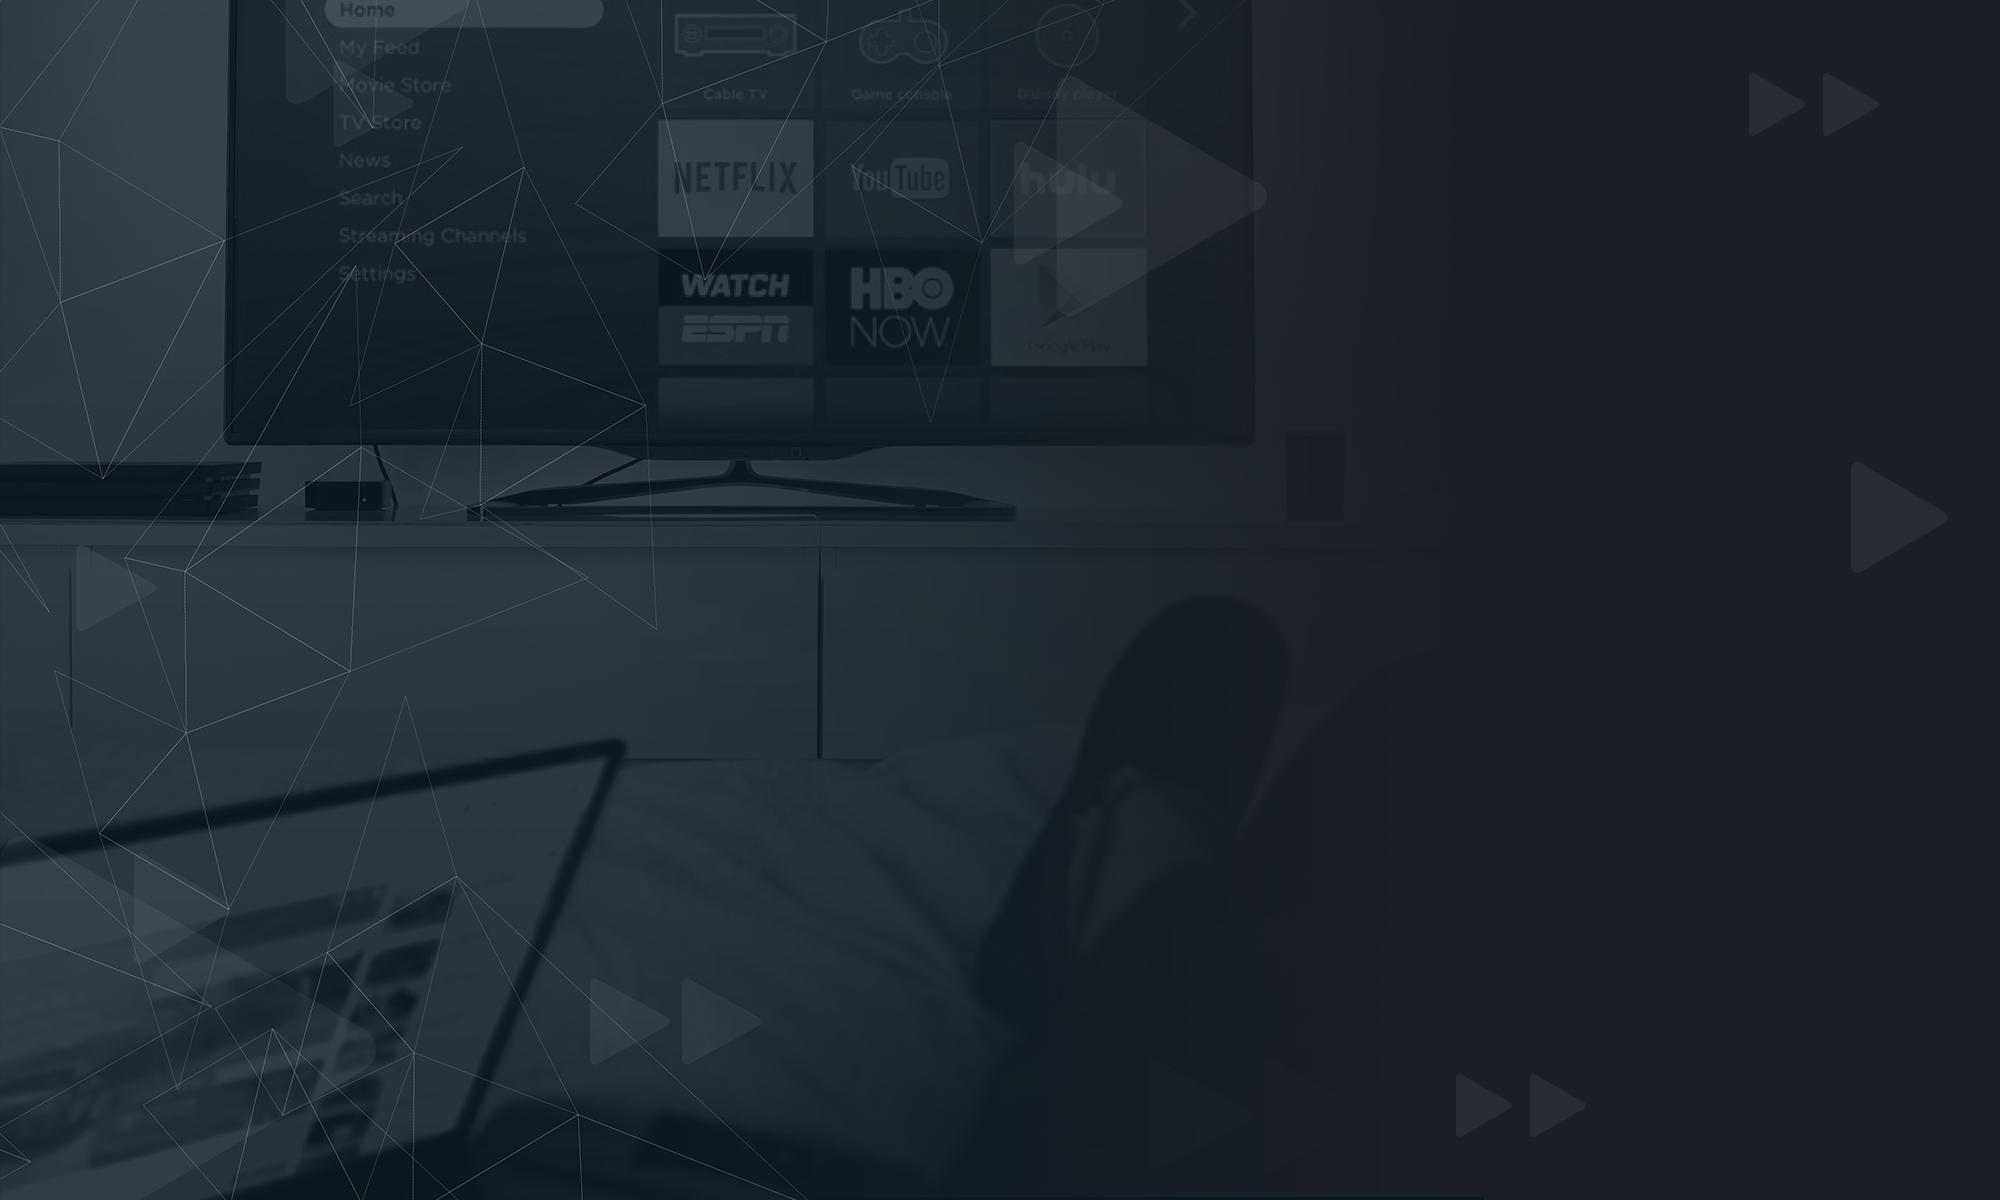 2019315_Innovid_Hubspot_Hero_Image_Benchmarks_Report